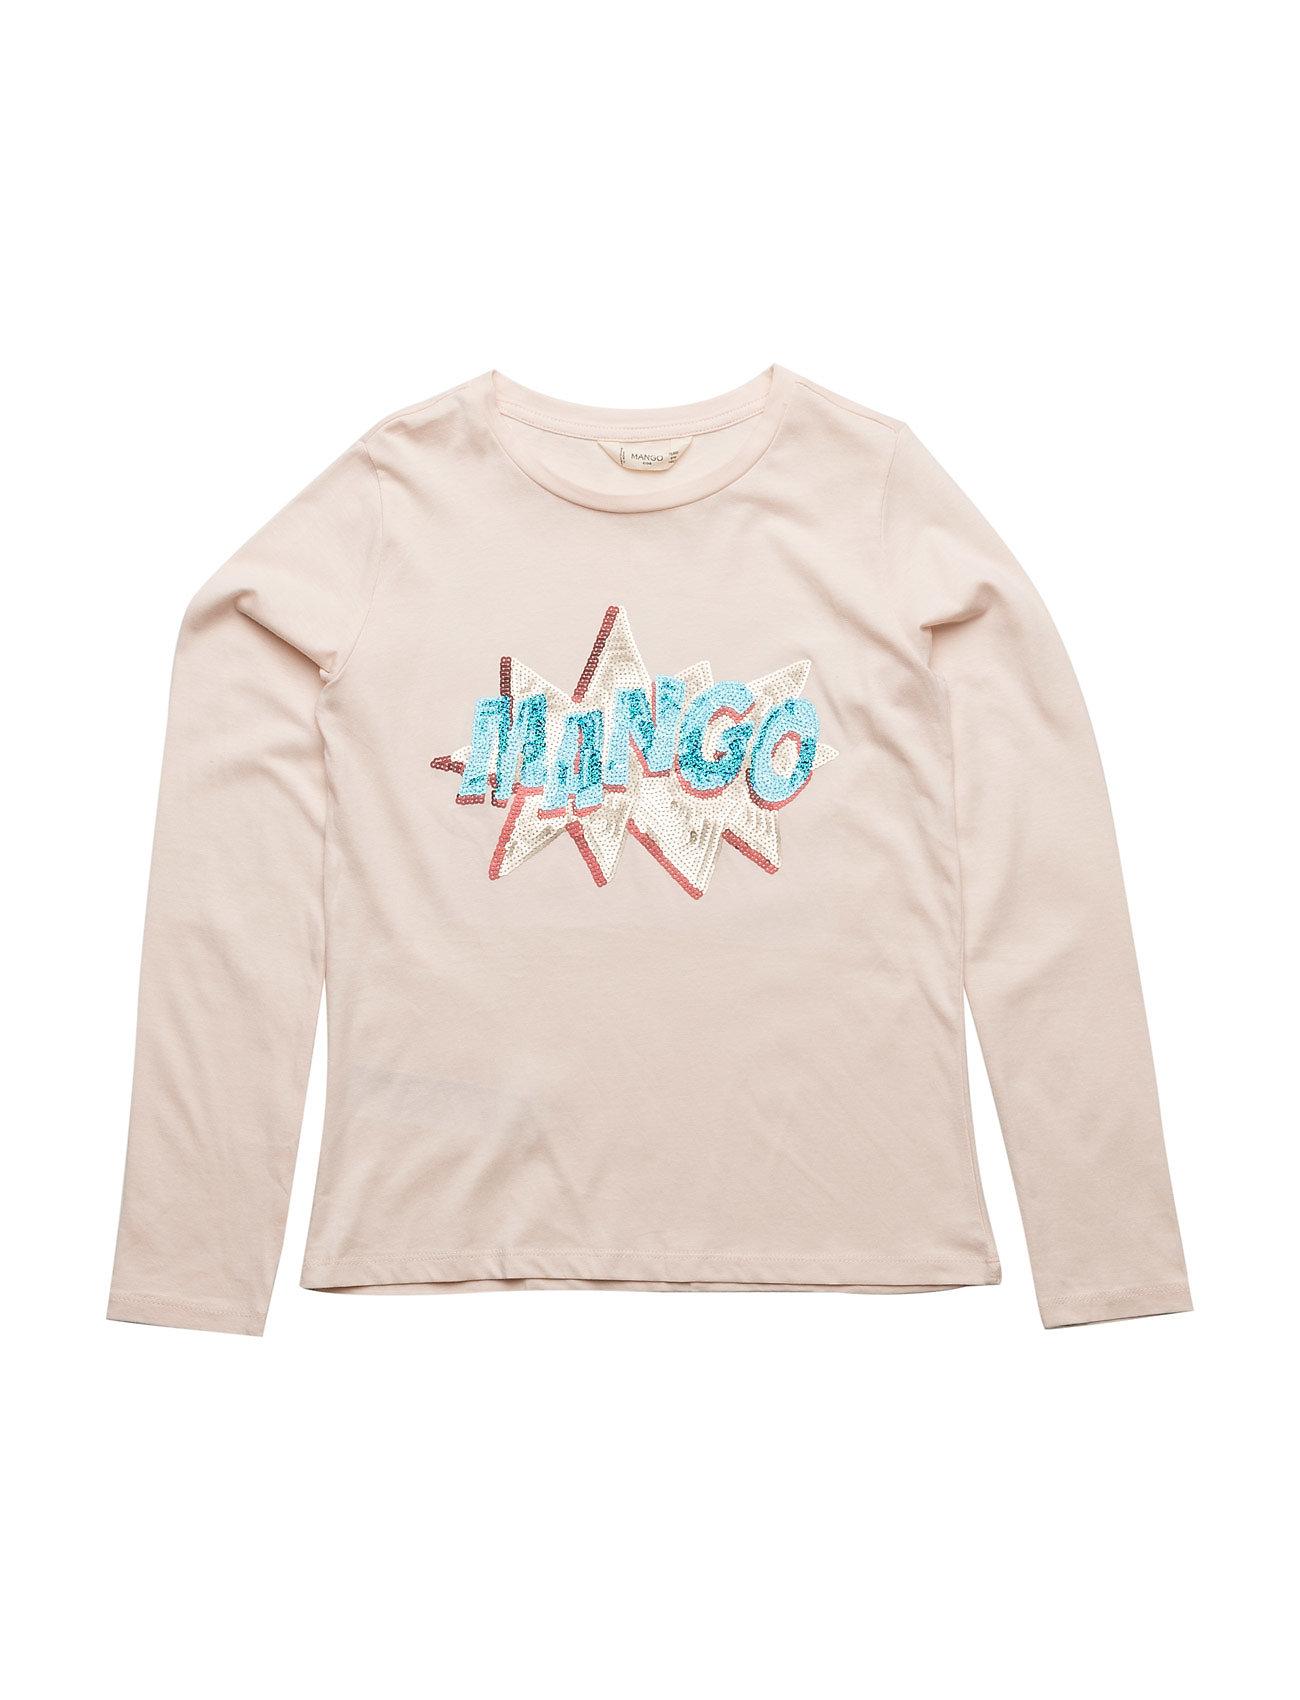 Mango Kids Embroidered sequin -shirt